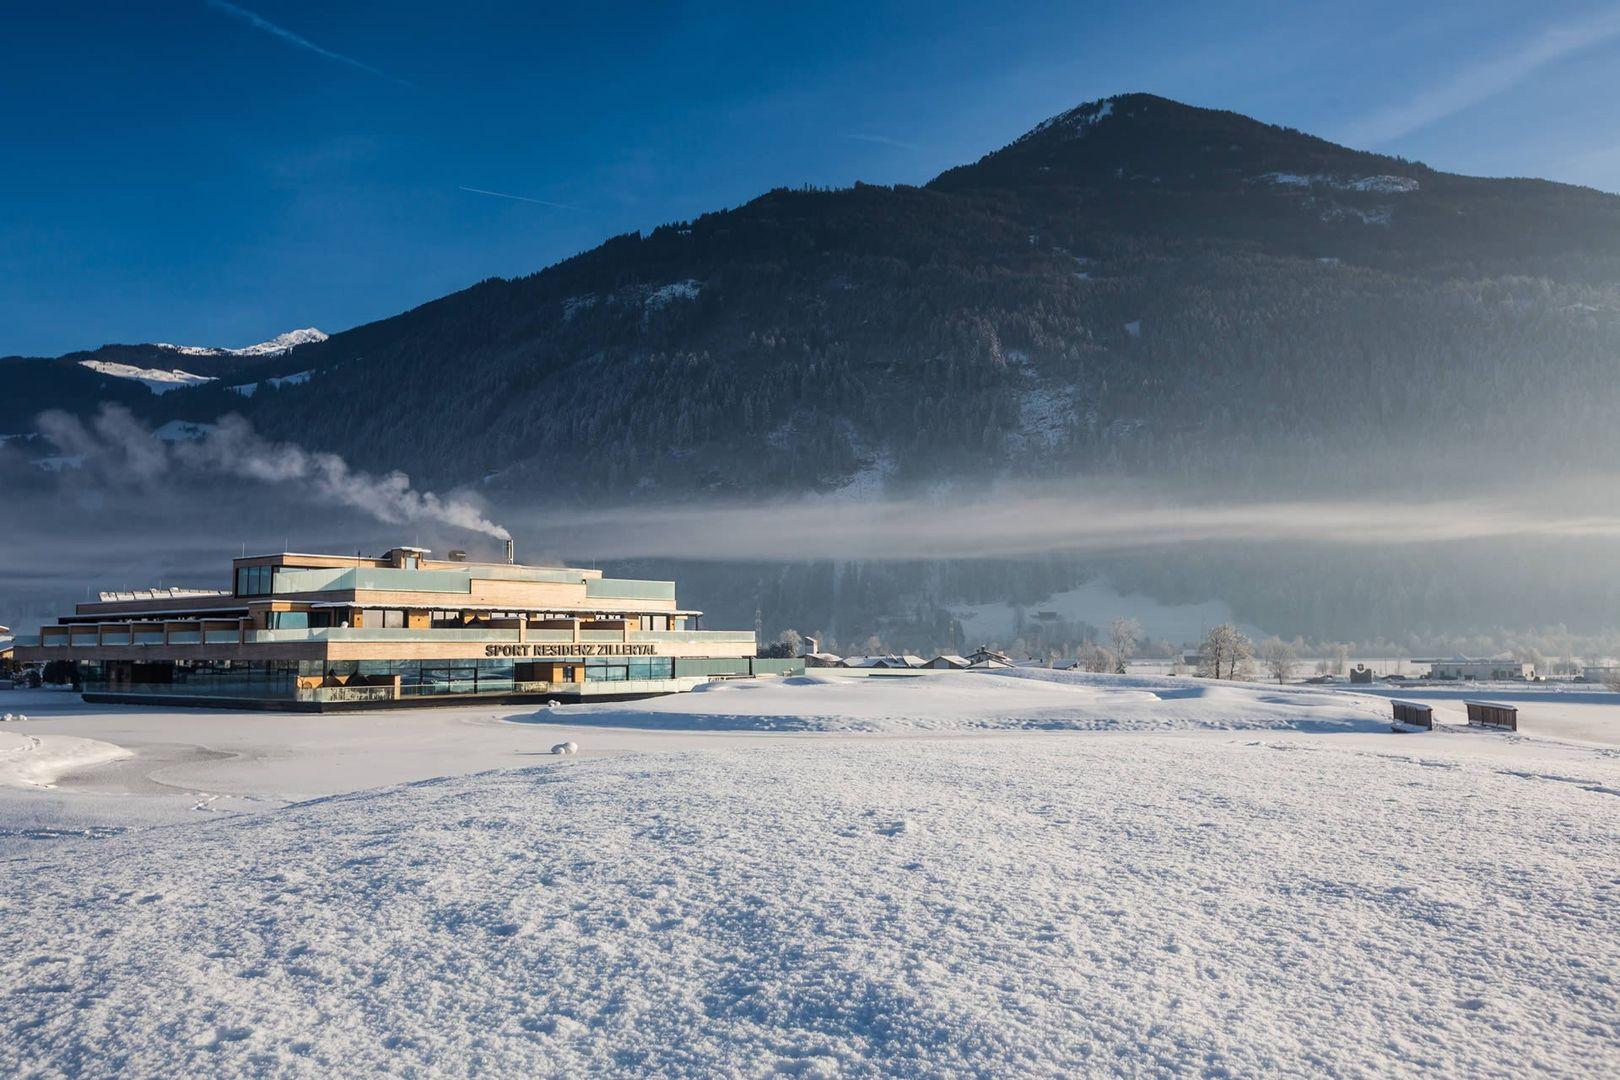 Sportresidenz Zillertal - Slide 1